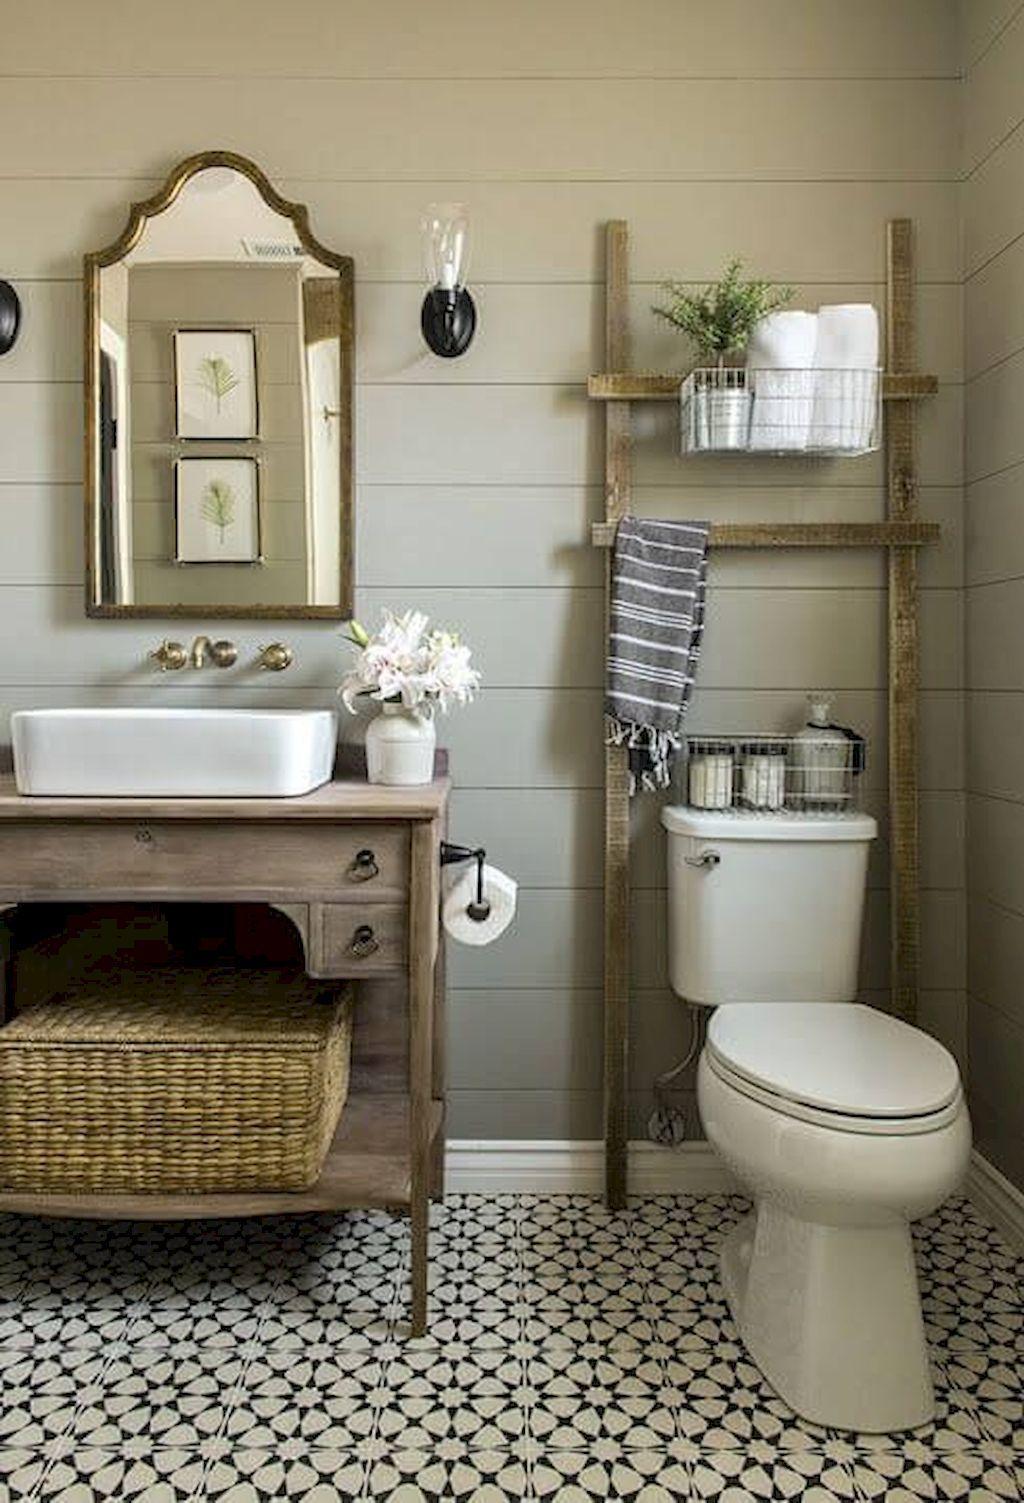 Apartment Bathroom Designs Simple 40 Graceful Tiny Apartment Bathroom Remodel Ideas On A Budget 2018